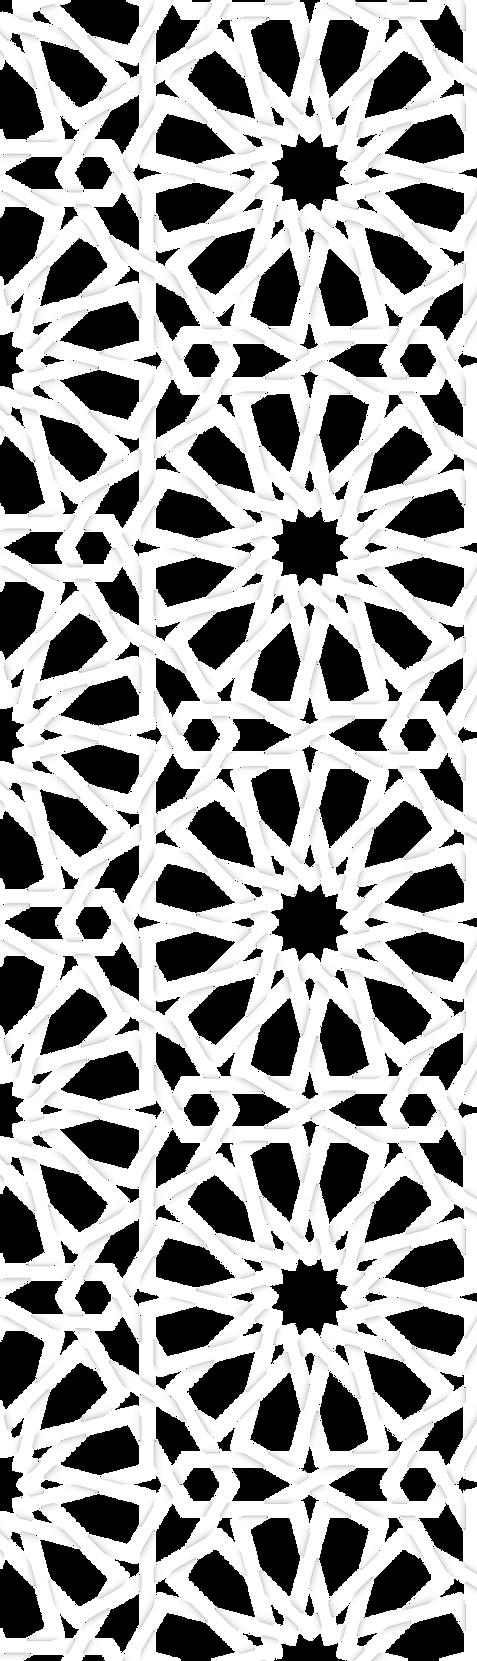 ISLAMIC-ART-BANNIERE.png